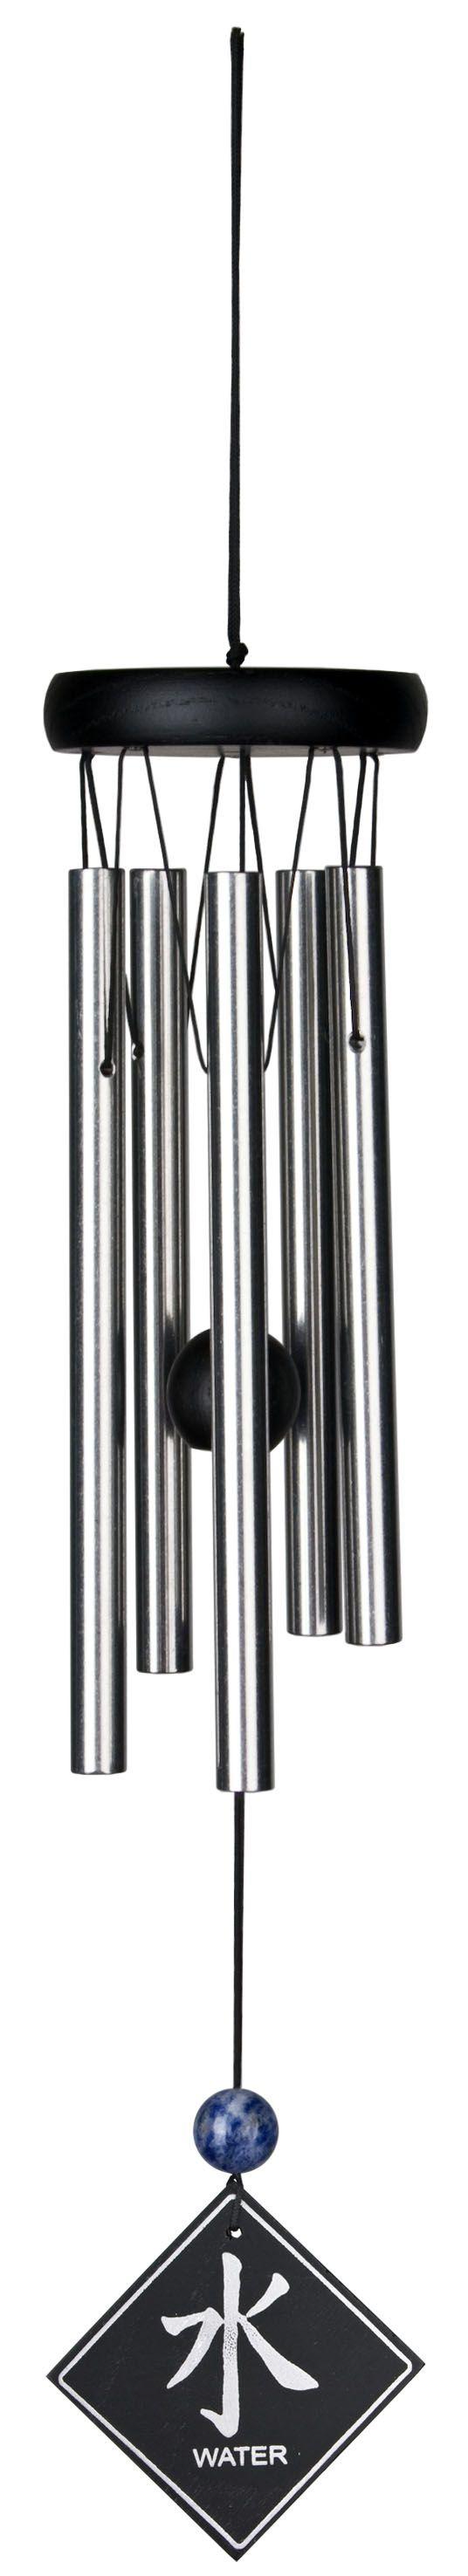 carillon feng shui eau. Black Bedroom Furniture Sets. Home Design Ideas